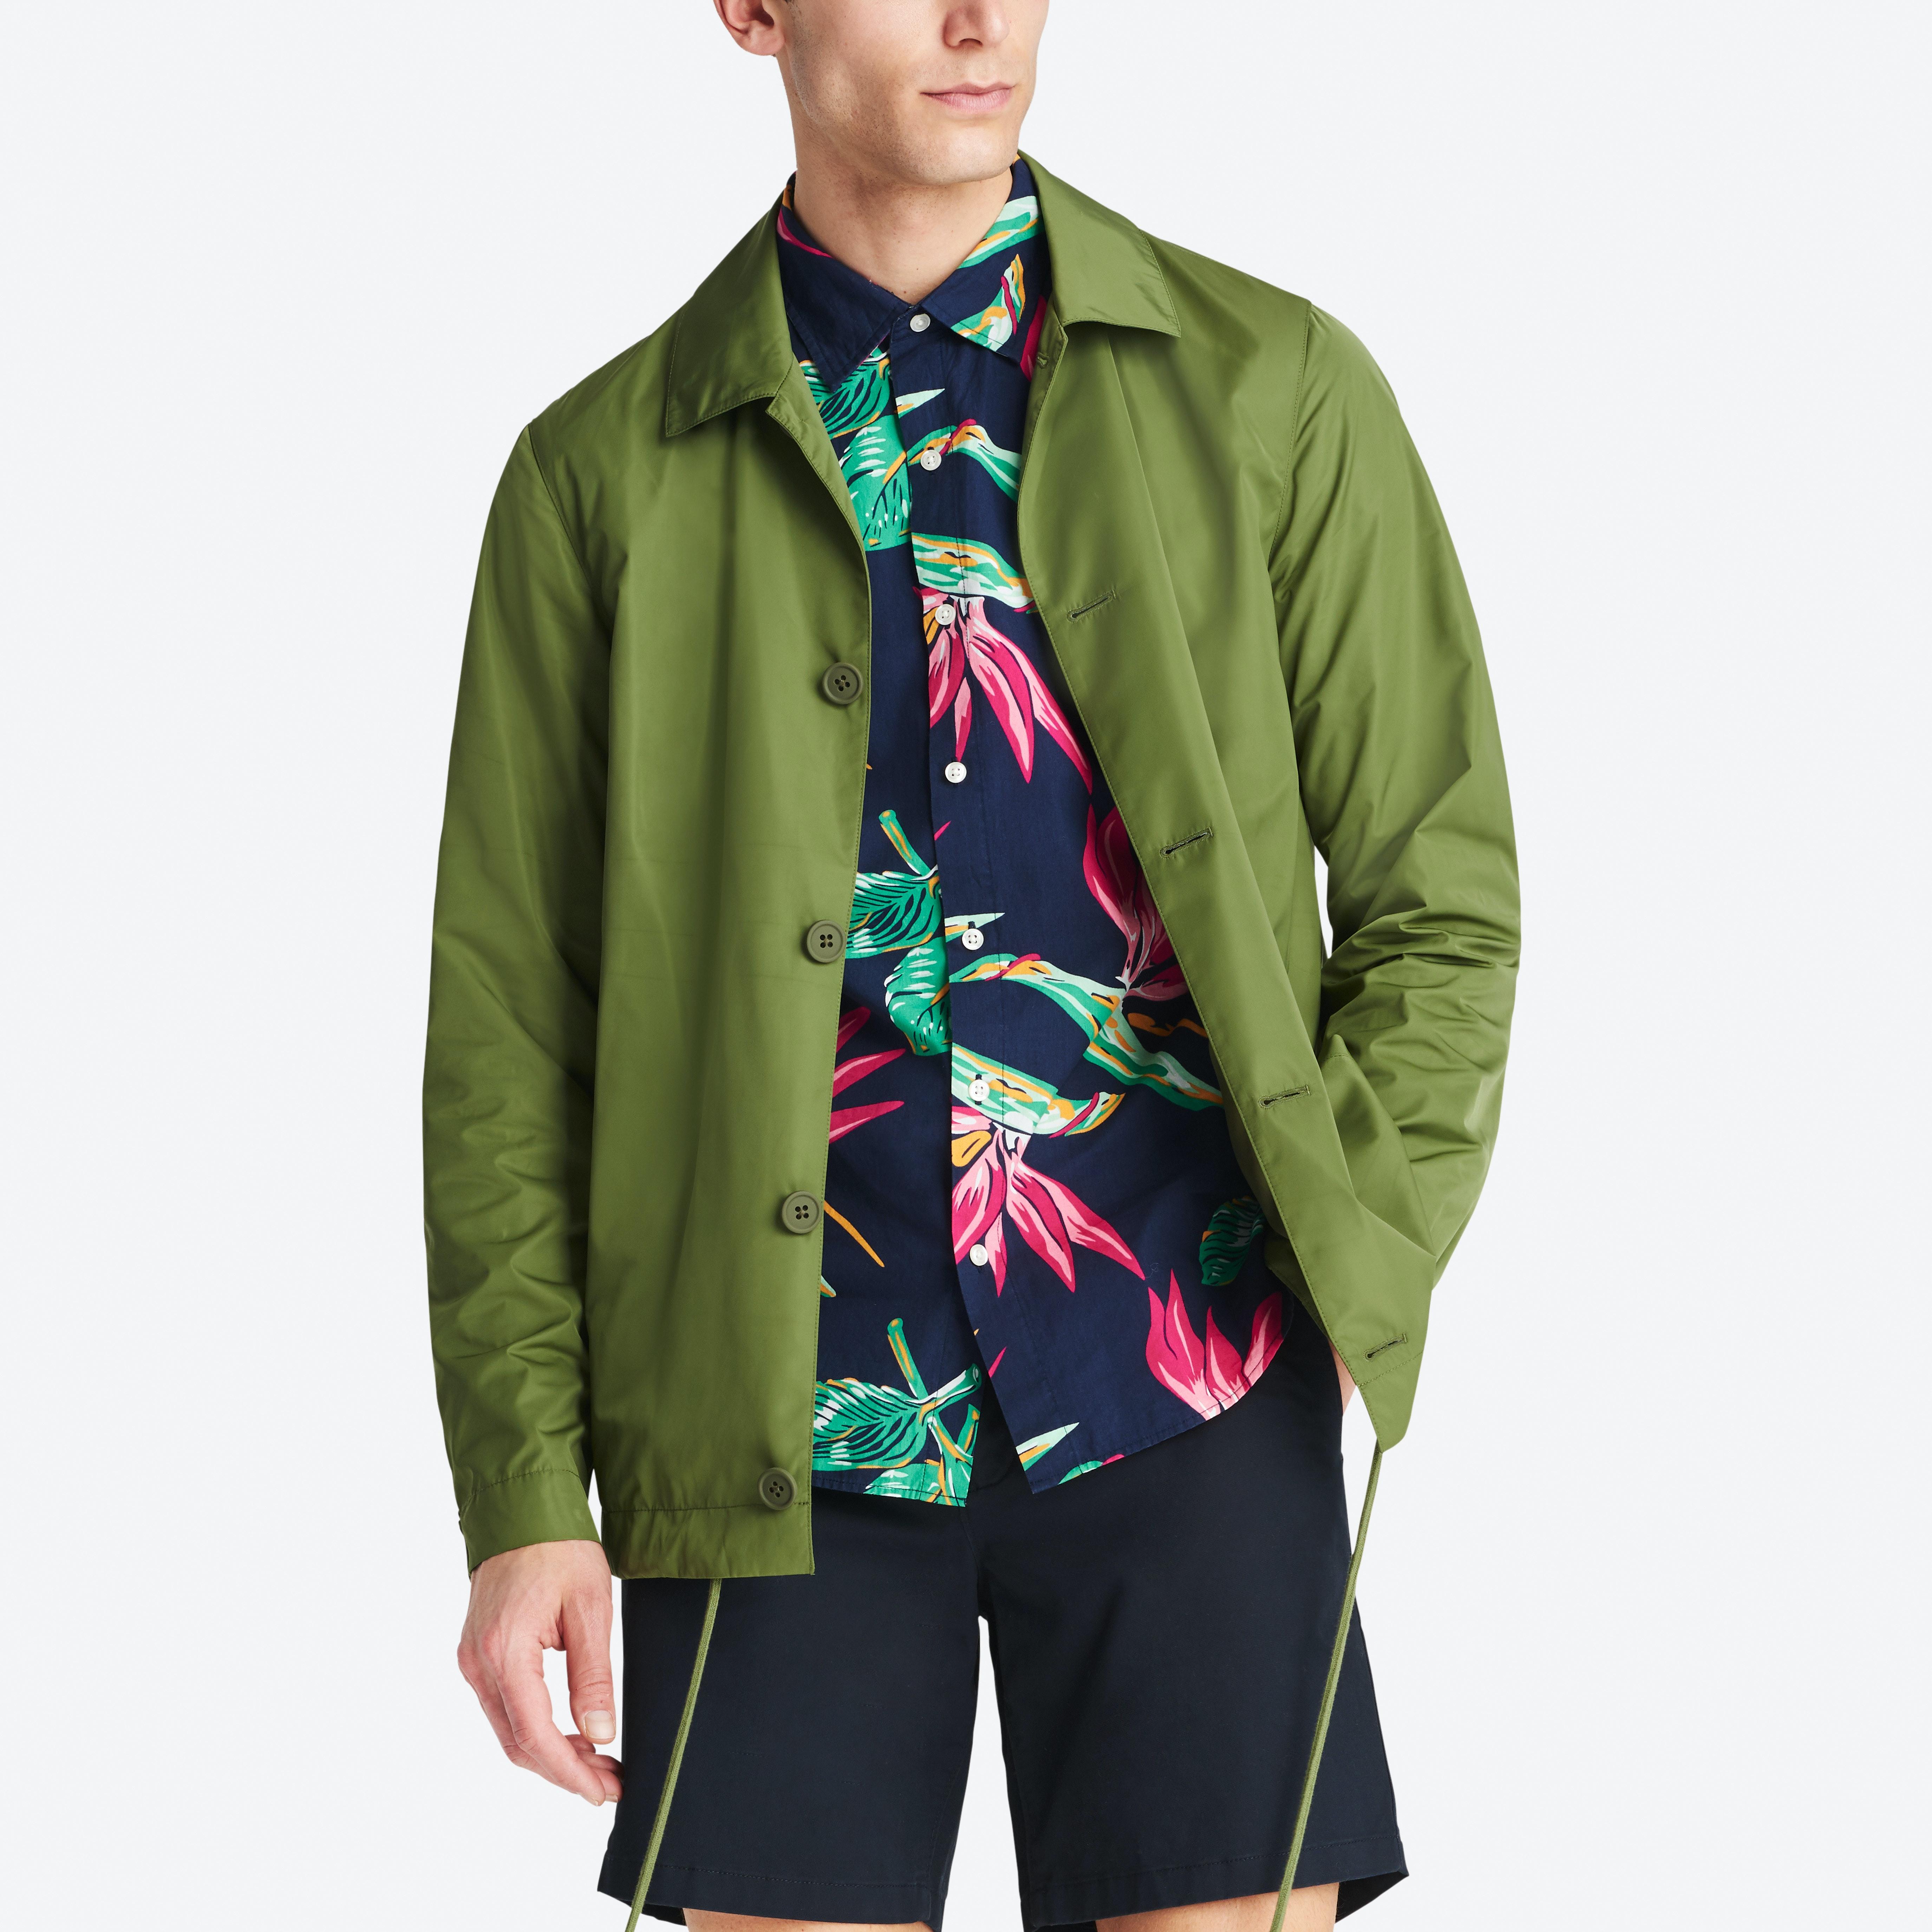 The Coach's Jacket